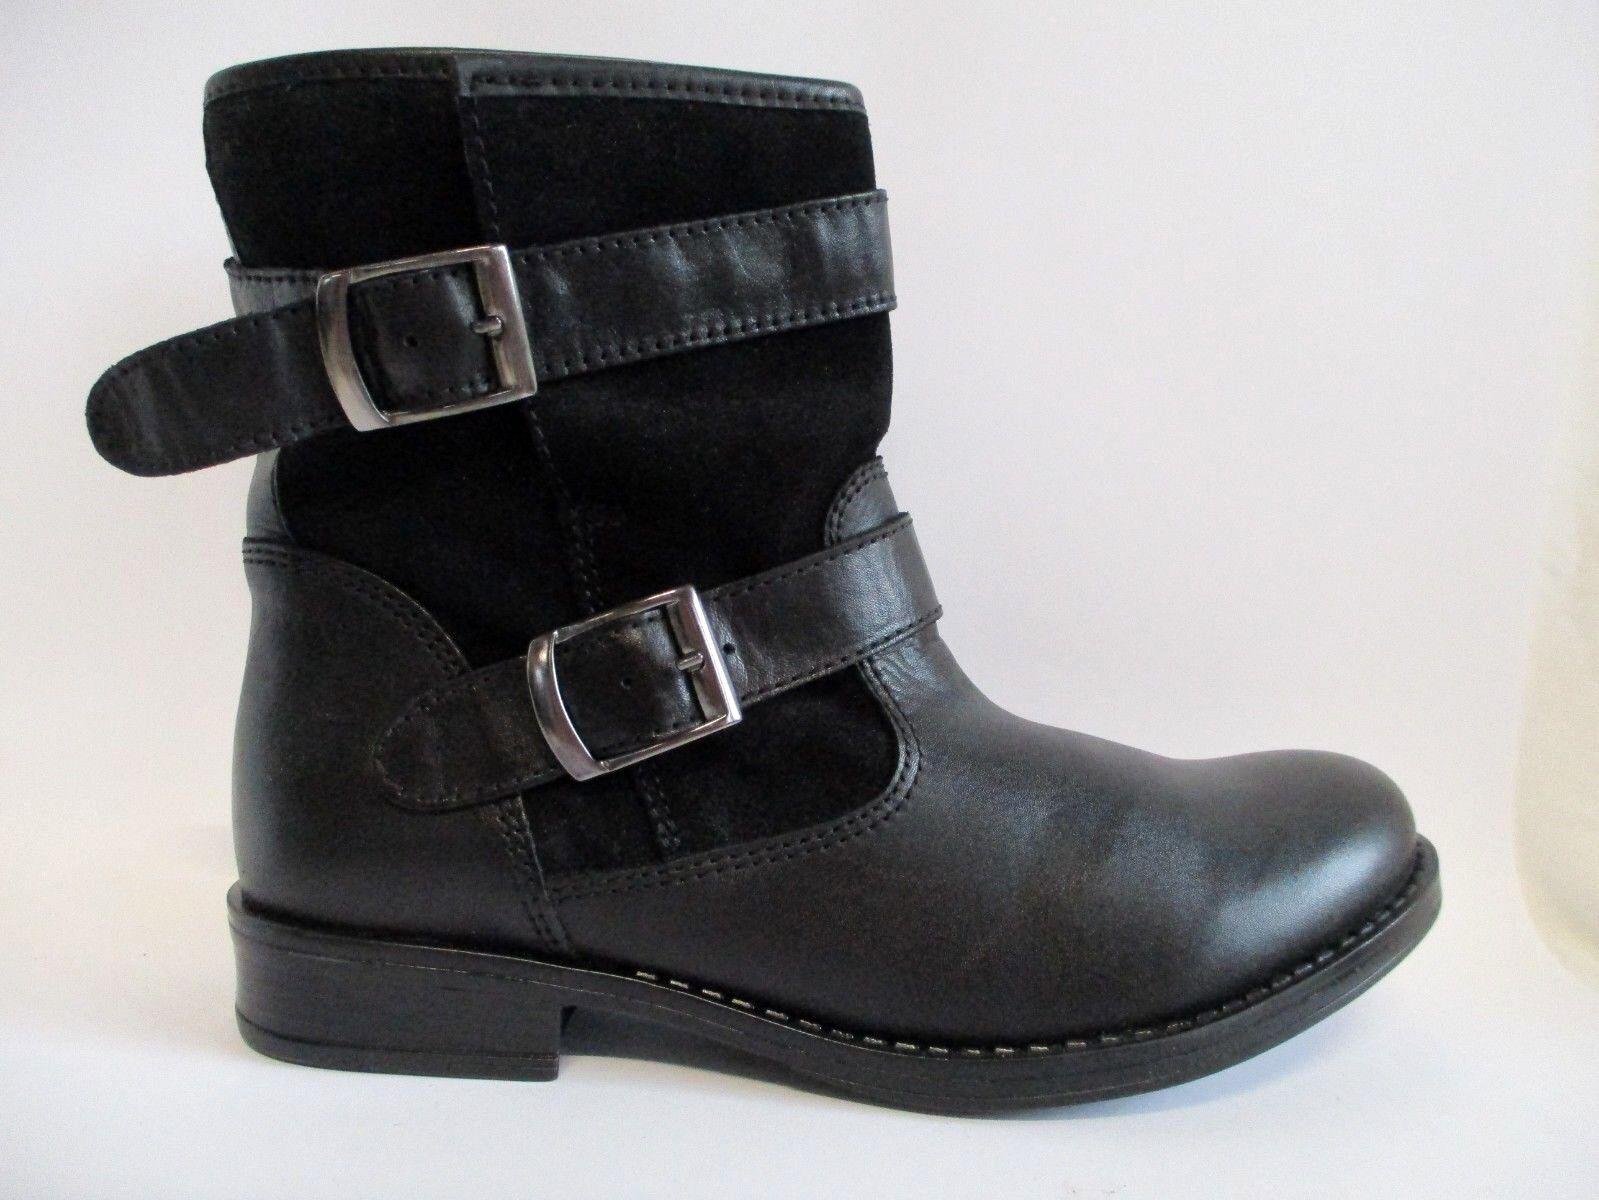 ZIGN Klassische Stiefeletten Gr.42 Ankle Chelsea Boot Leder Schwarz Gr.42 Stiefeletten  C37 2f7bf0